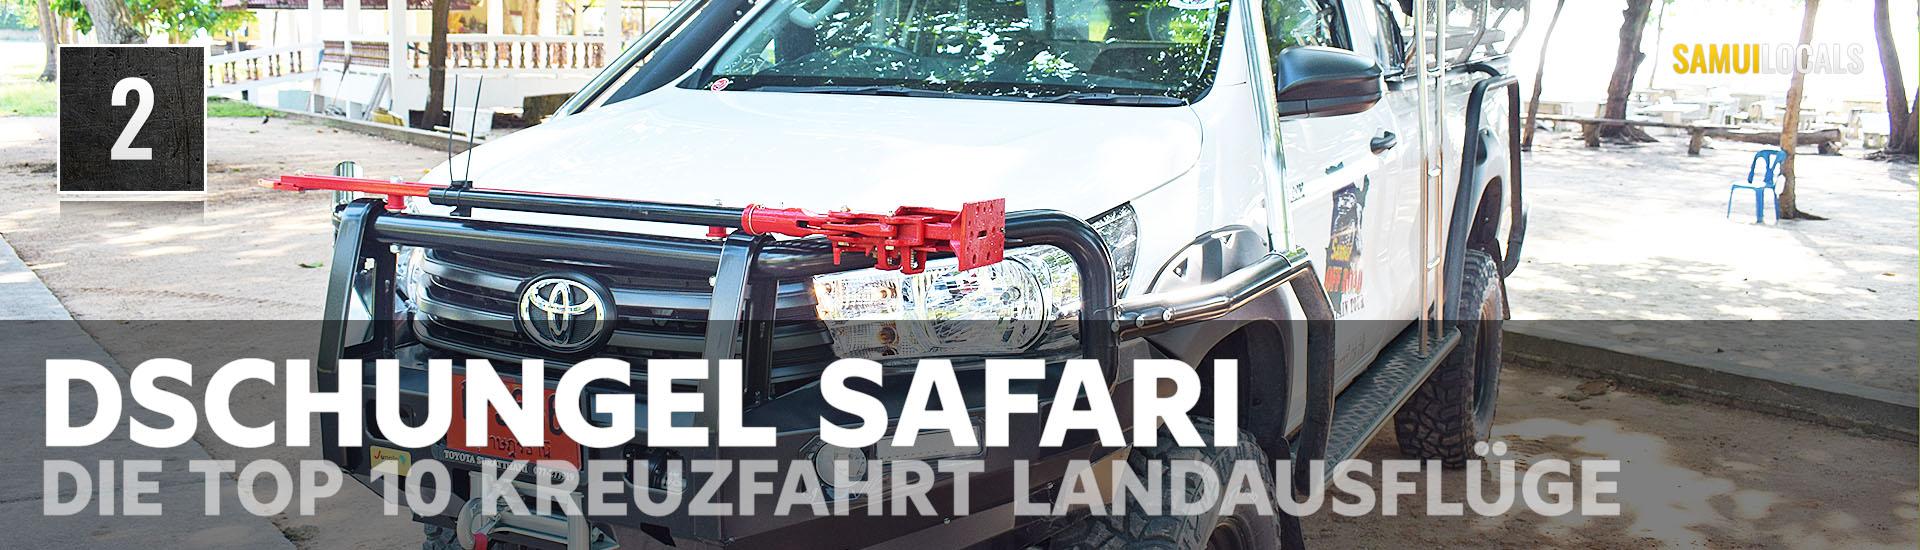 top_10_kreuzfahrt_landausfluege_dschungel_safari